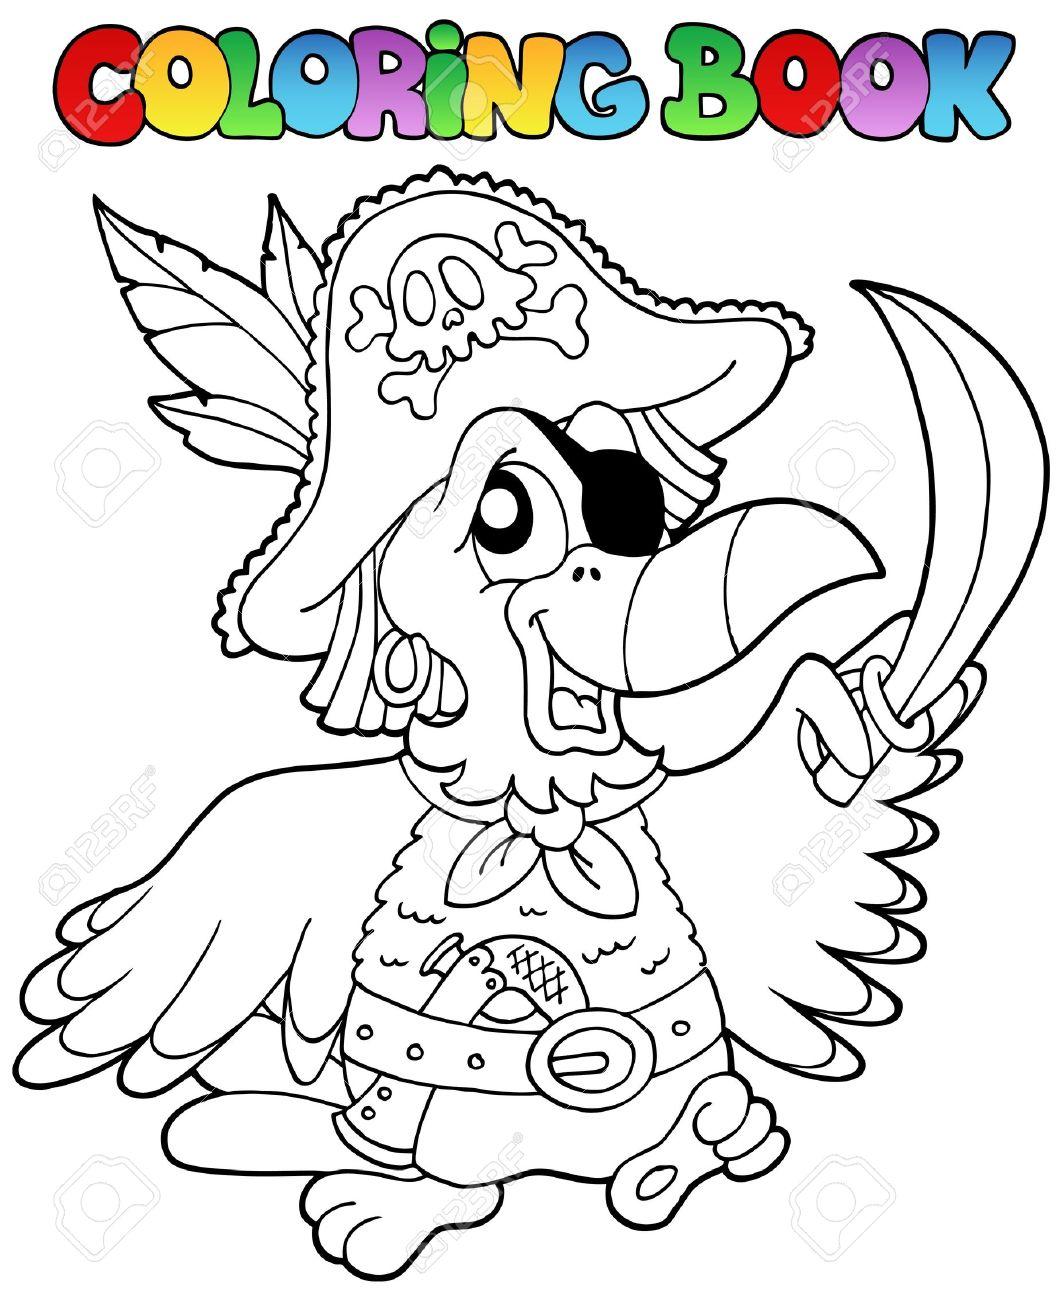 Libro Para Colorear Con Loro Pirata - Ilustración Vectorial ...